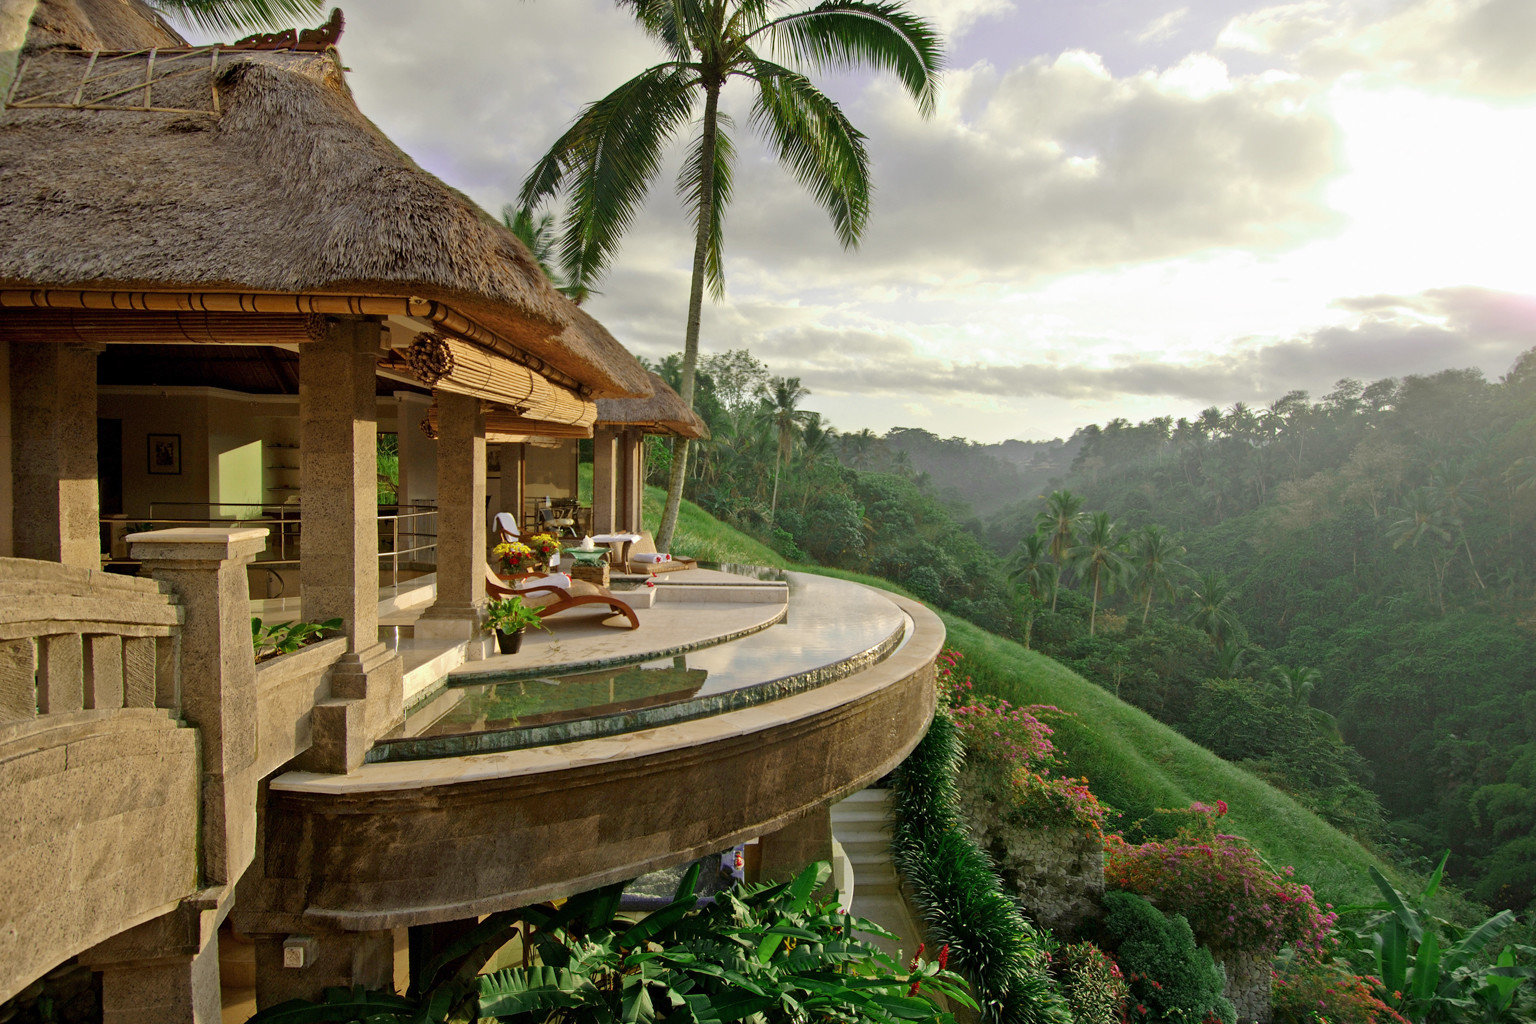 Elegant Hotels Luxury Pool Tropical outdoor estate vacation Resort Jungle mansion stone